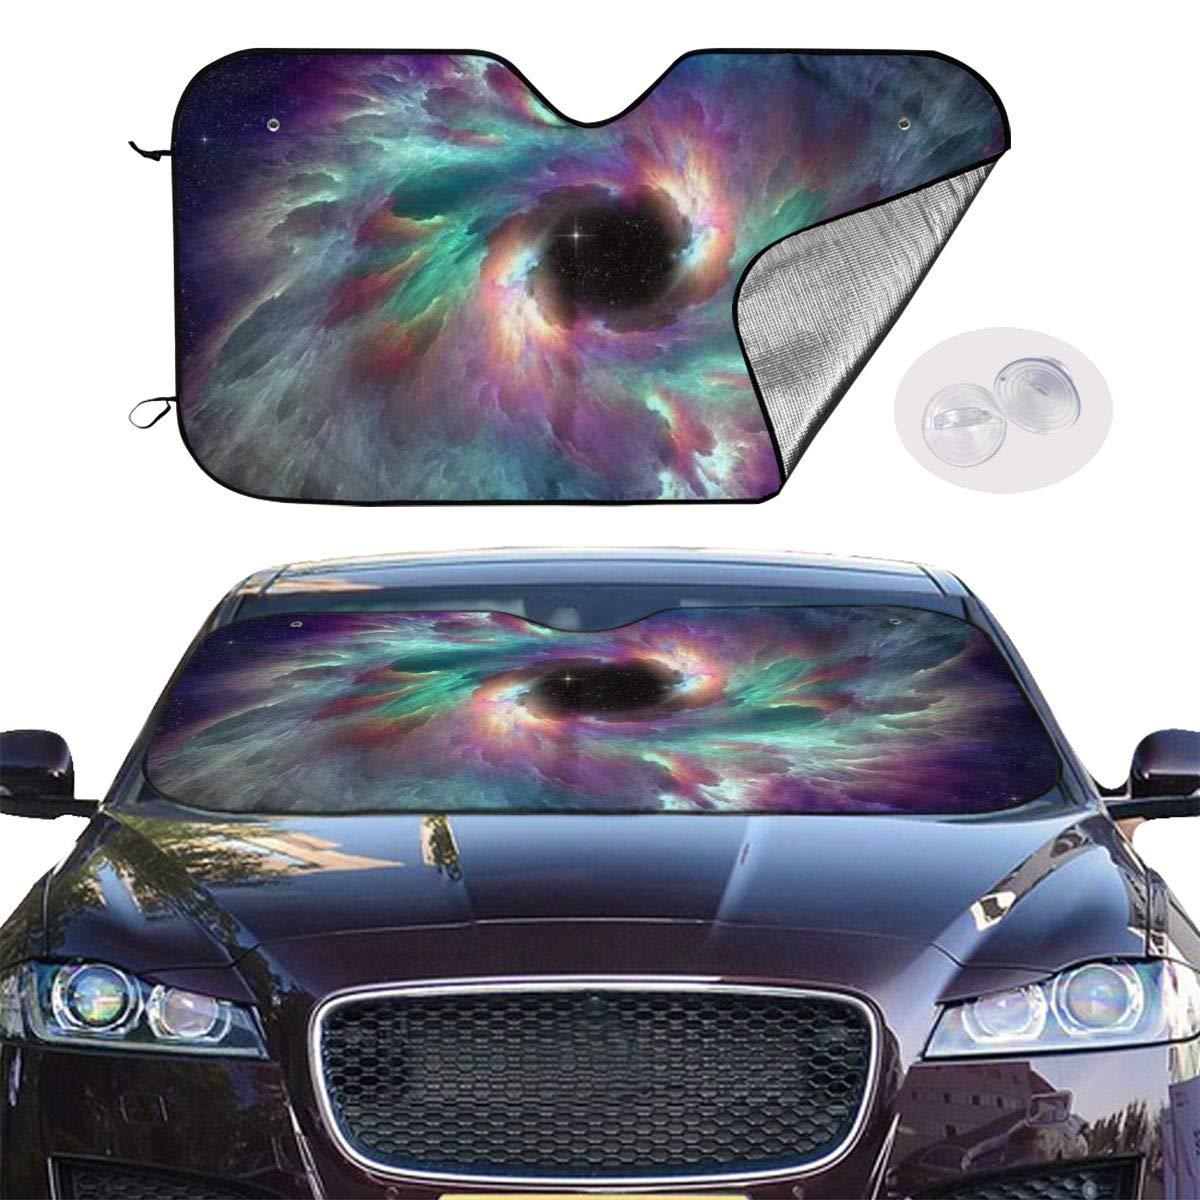 Windshield Sunshade for Car Foldable UV Ray Reflector Auto Front Window Sun Shade Visor Shield Cover, Keeps Vehicle Cool, Cosmic by Sha-de